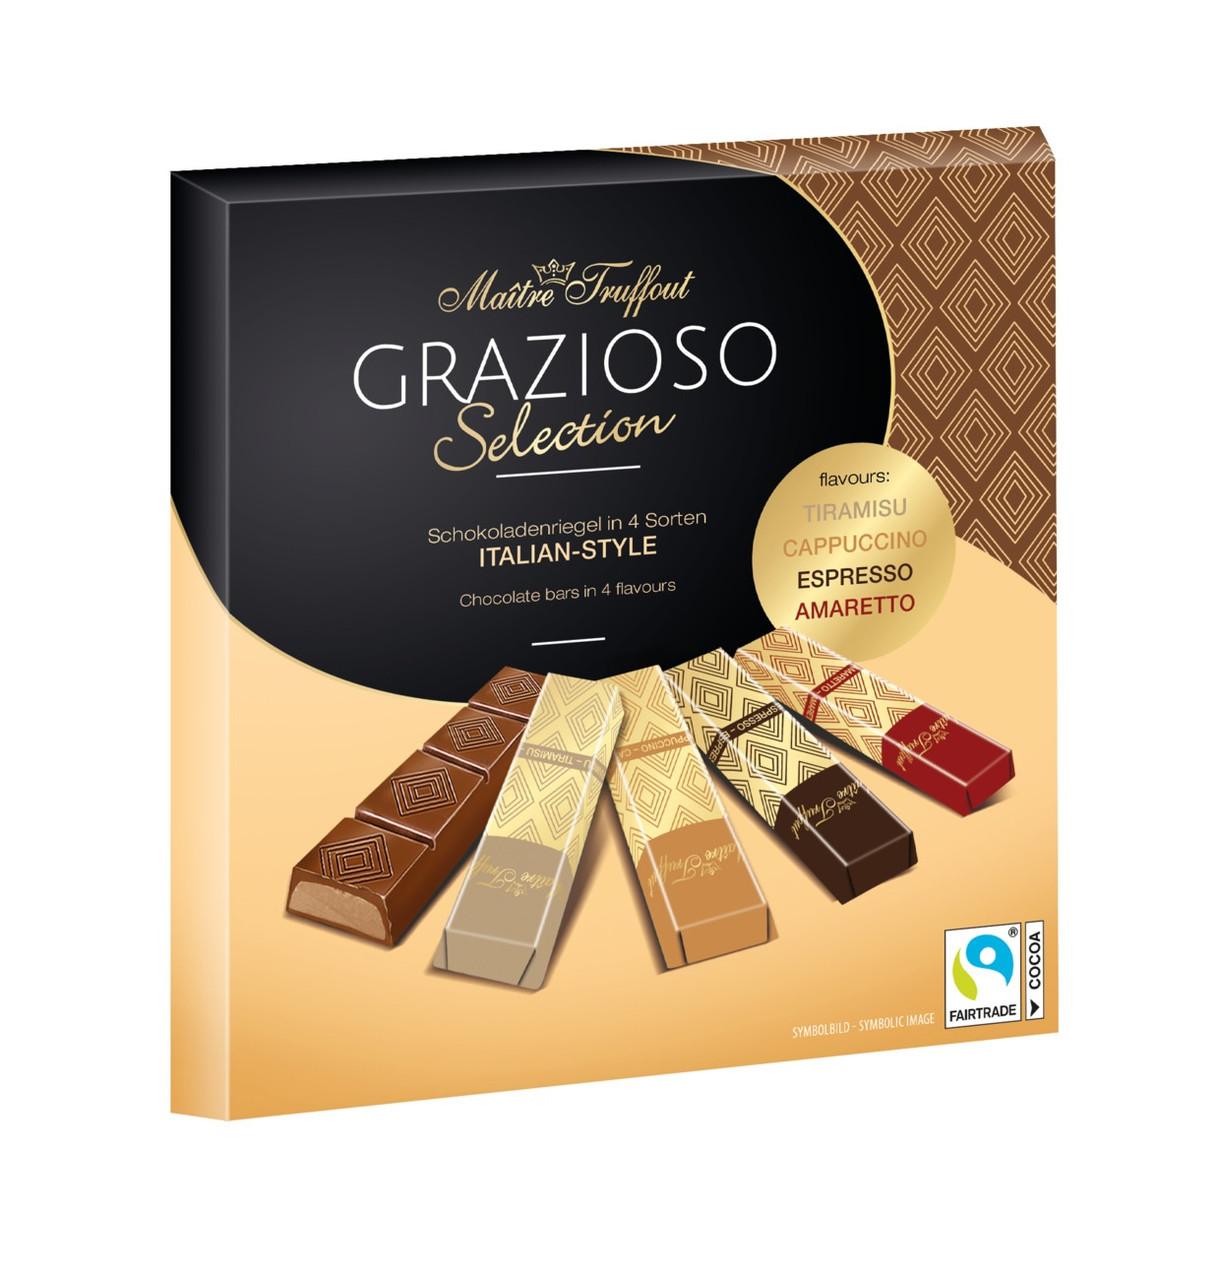 Шоколад ассорти Maitre Truffout Grazioso Selection 200 г Австрия